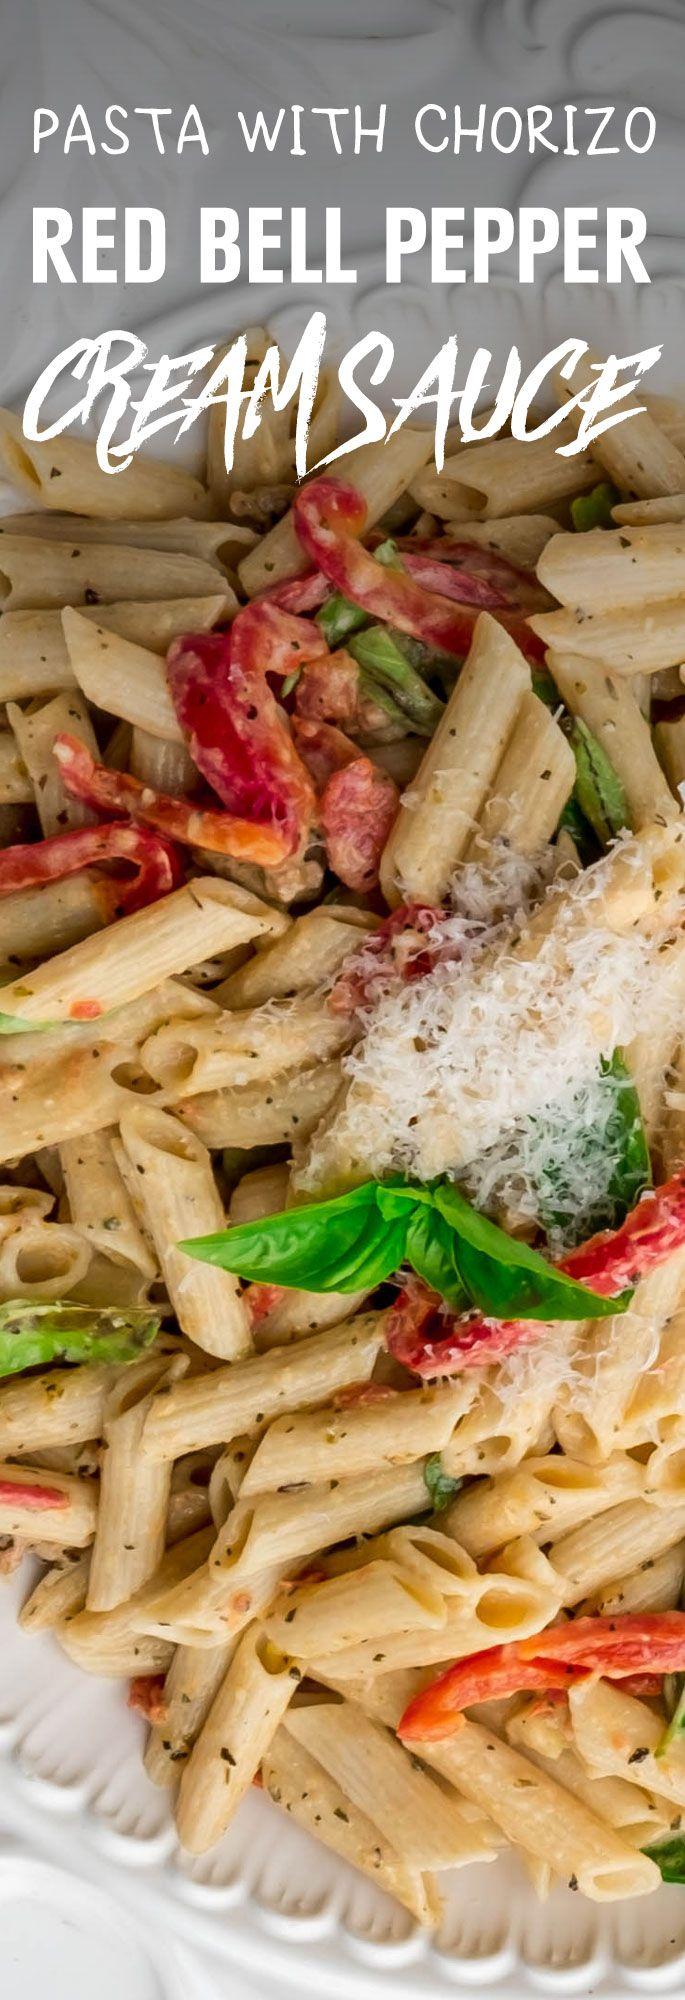 ... free pasta recipe easy gluten dish shared pasta pasta pasta pasta